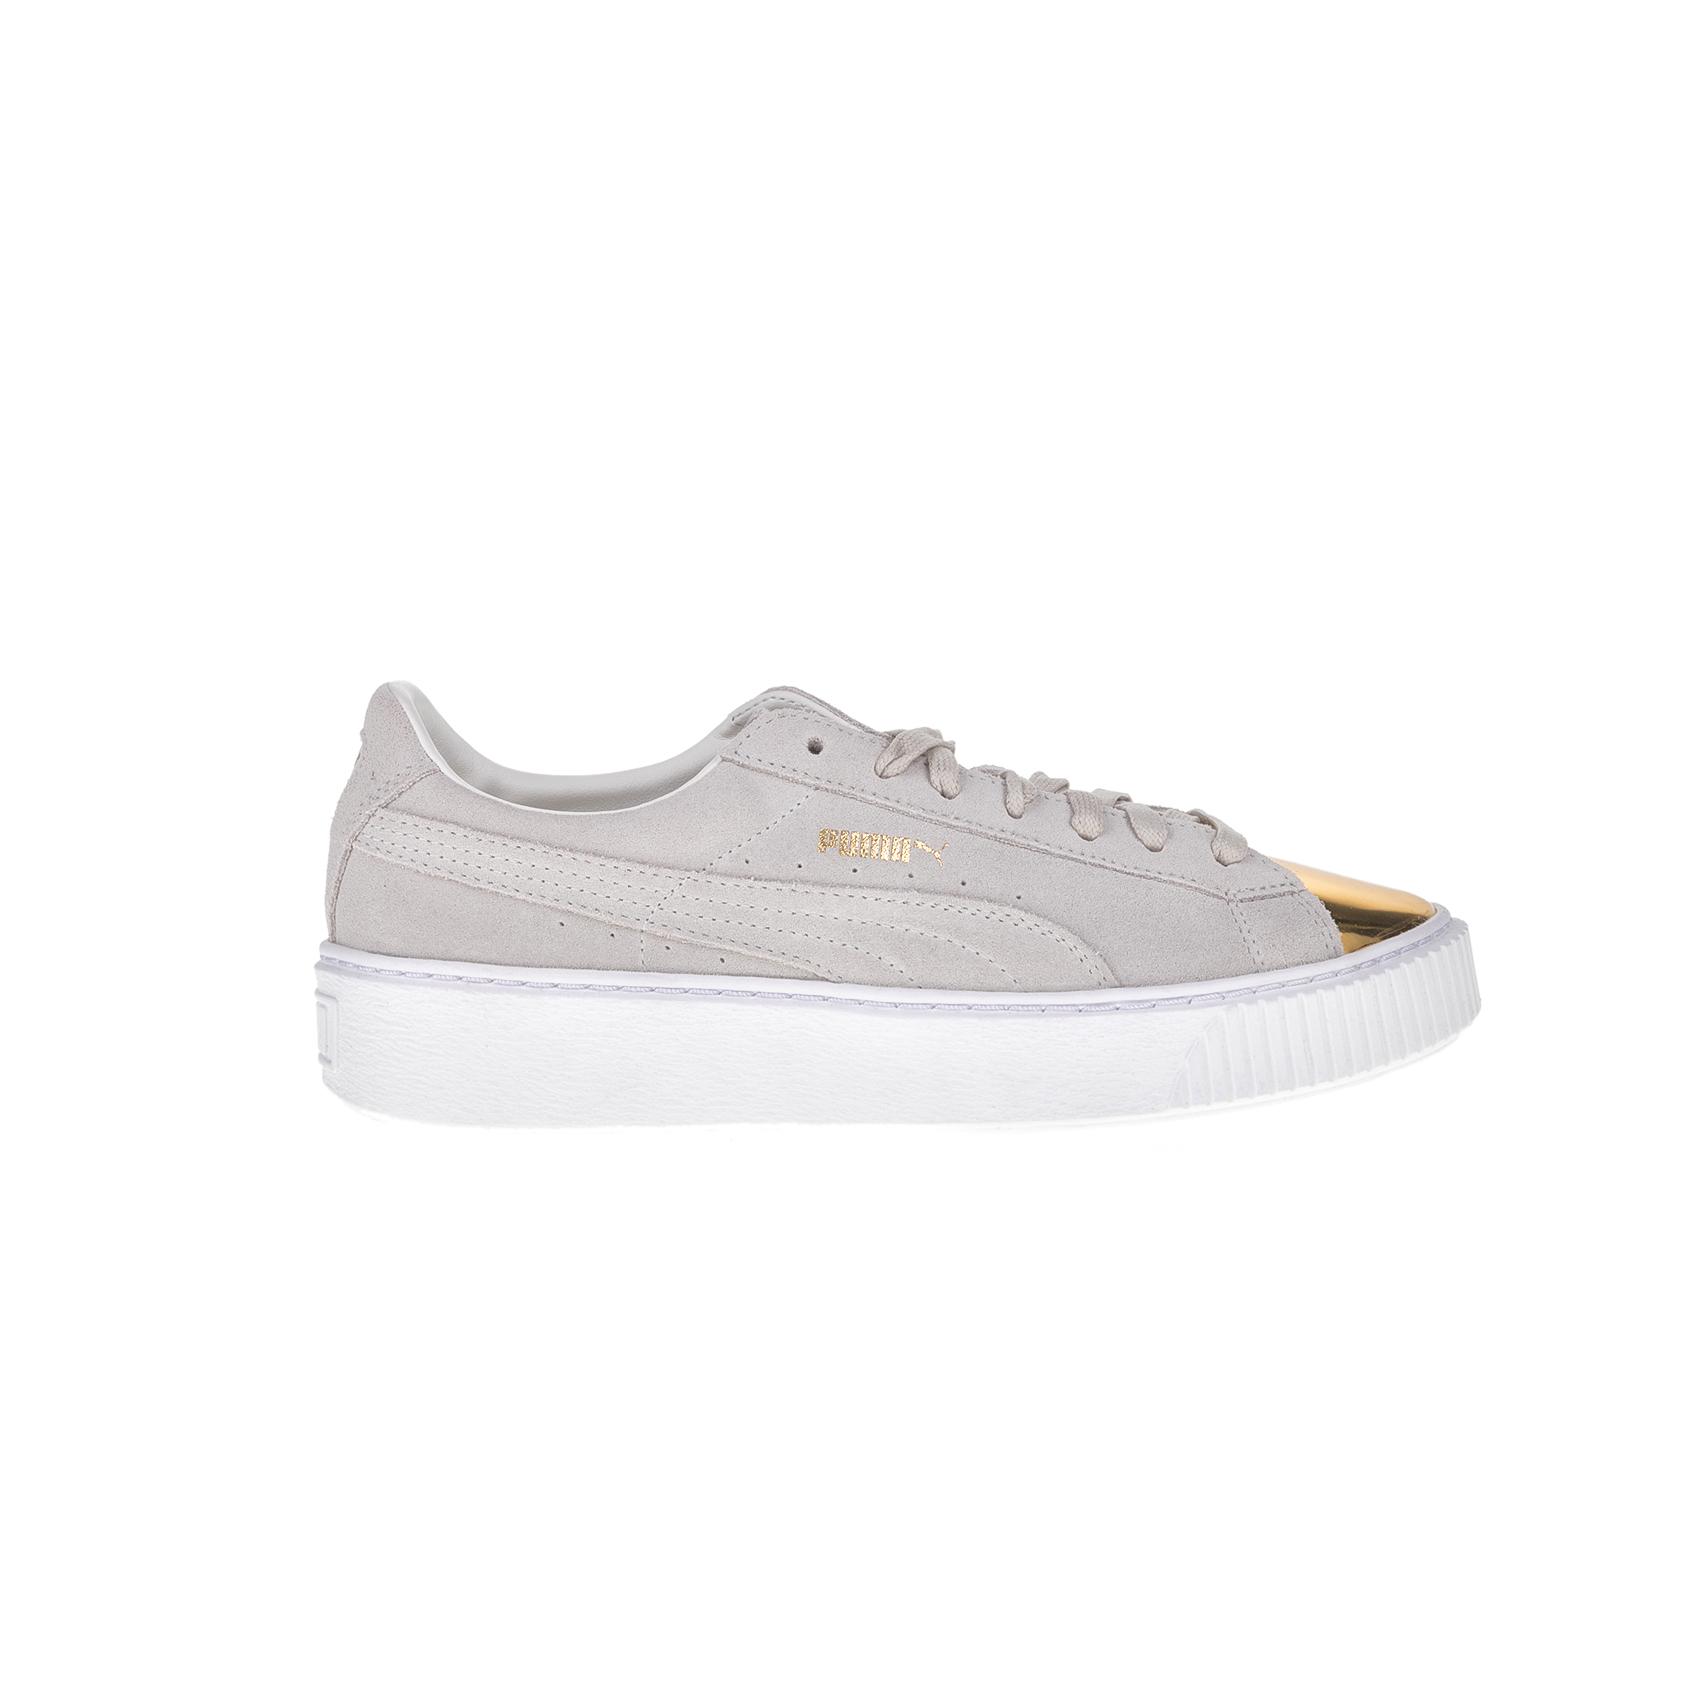 9167b33414a PUMA – Γυναικεία sneakers Puma SUEDE PLATFORM μπεζ – χρυσά Γυναικεία/ Παπούτσια/Sneakers PUMA